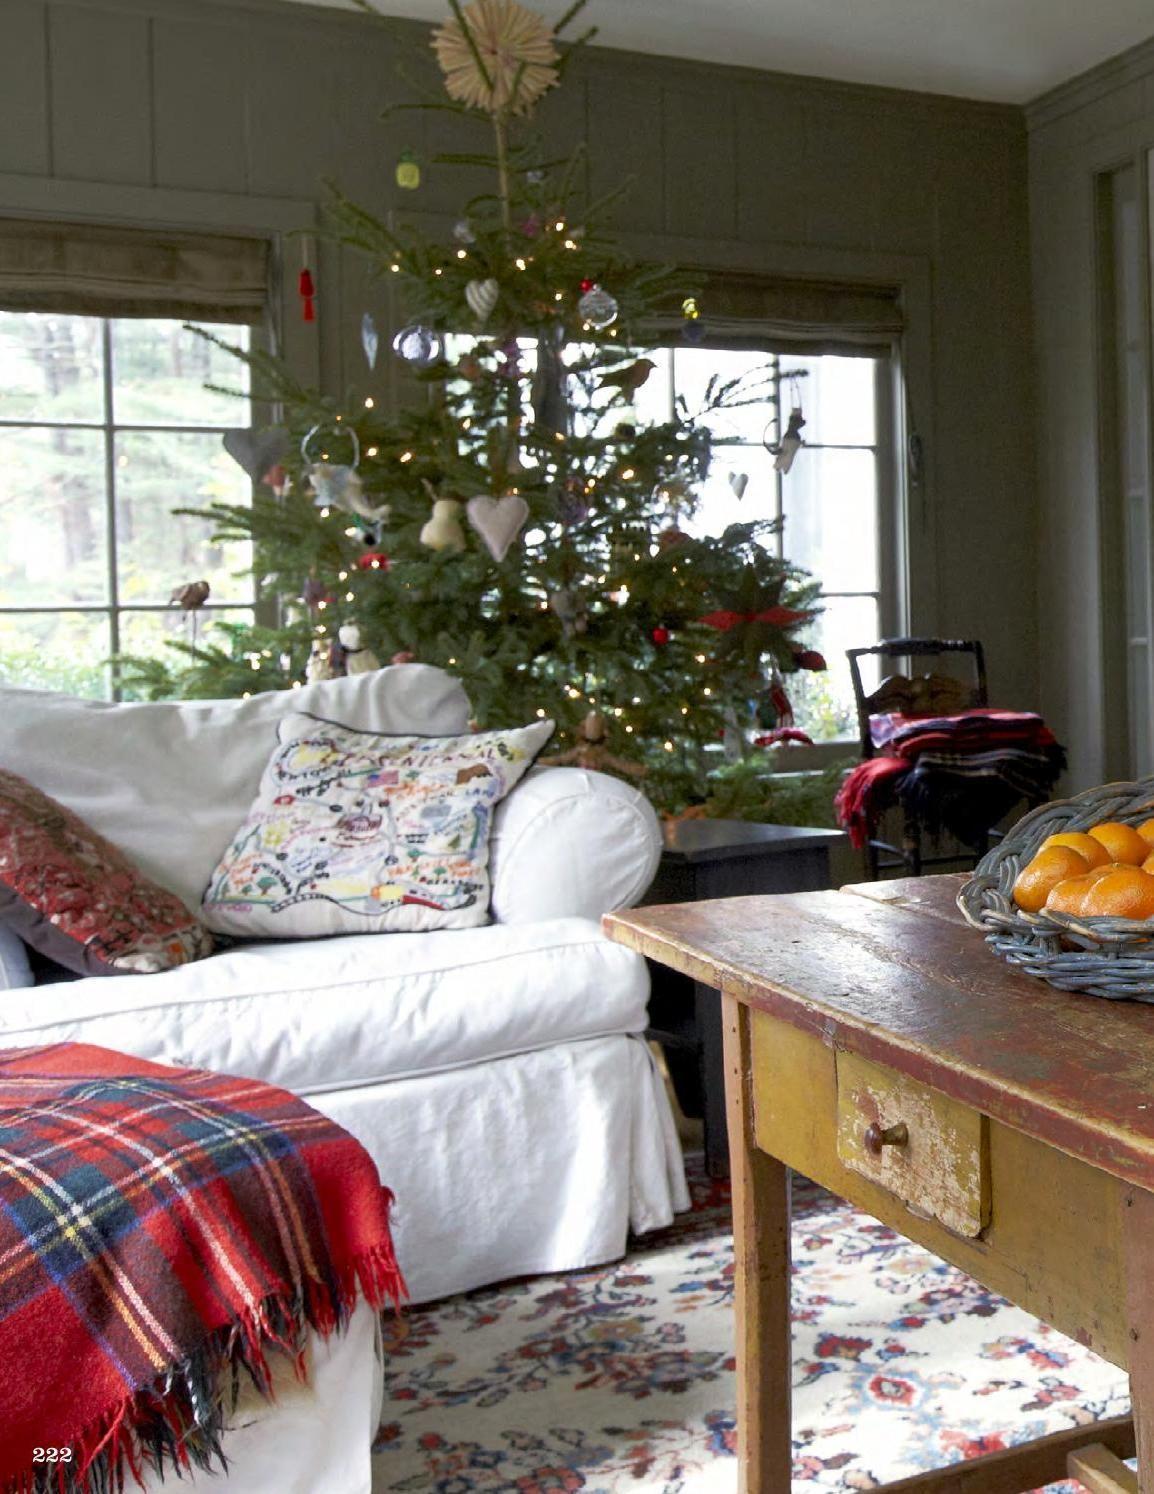 ClippedOnIssuu from Nora Murphy Country House Seasons